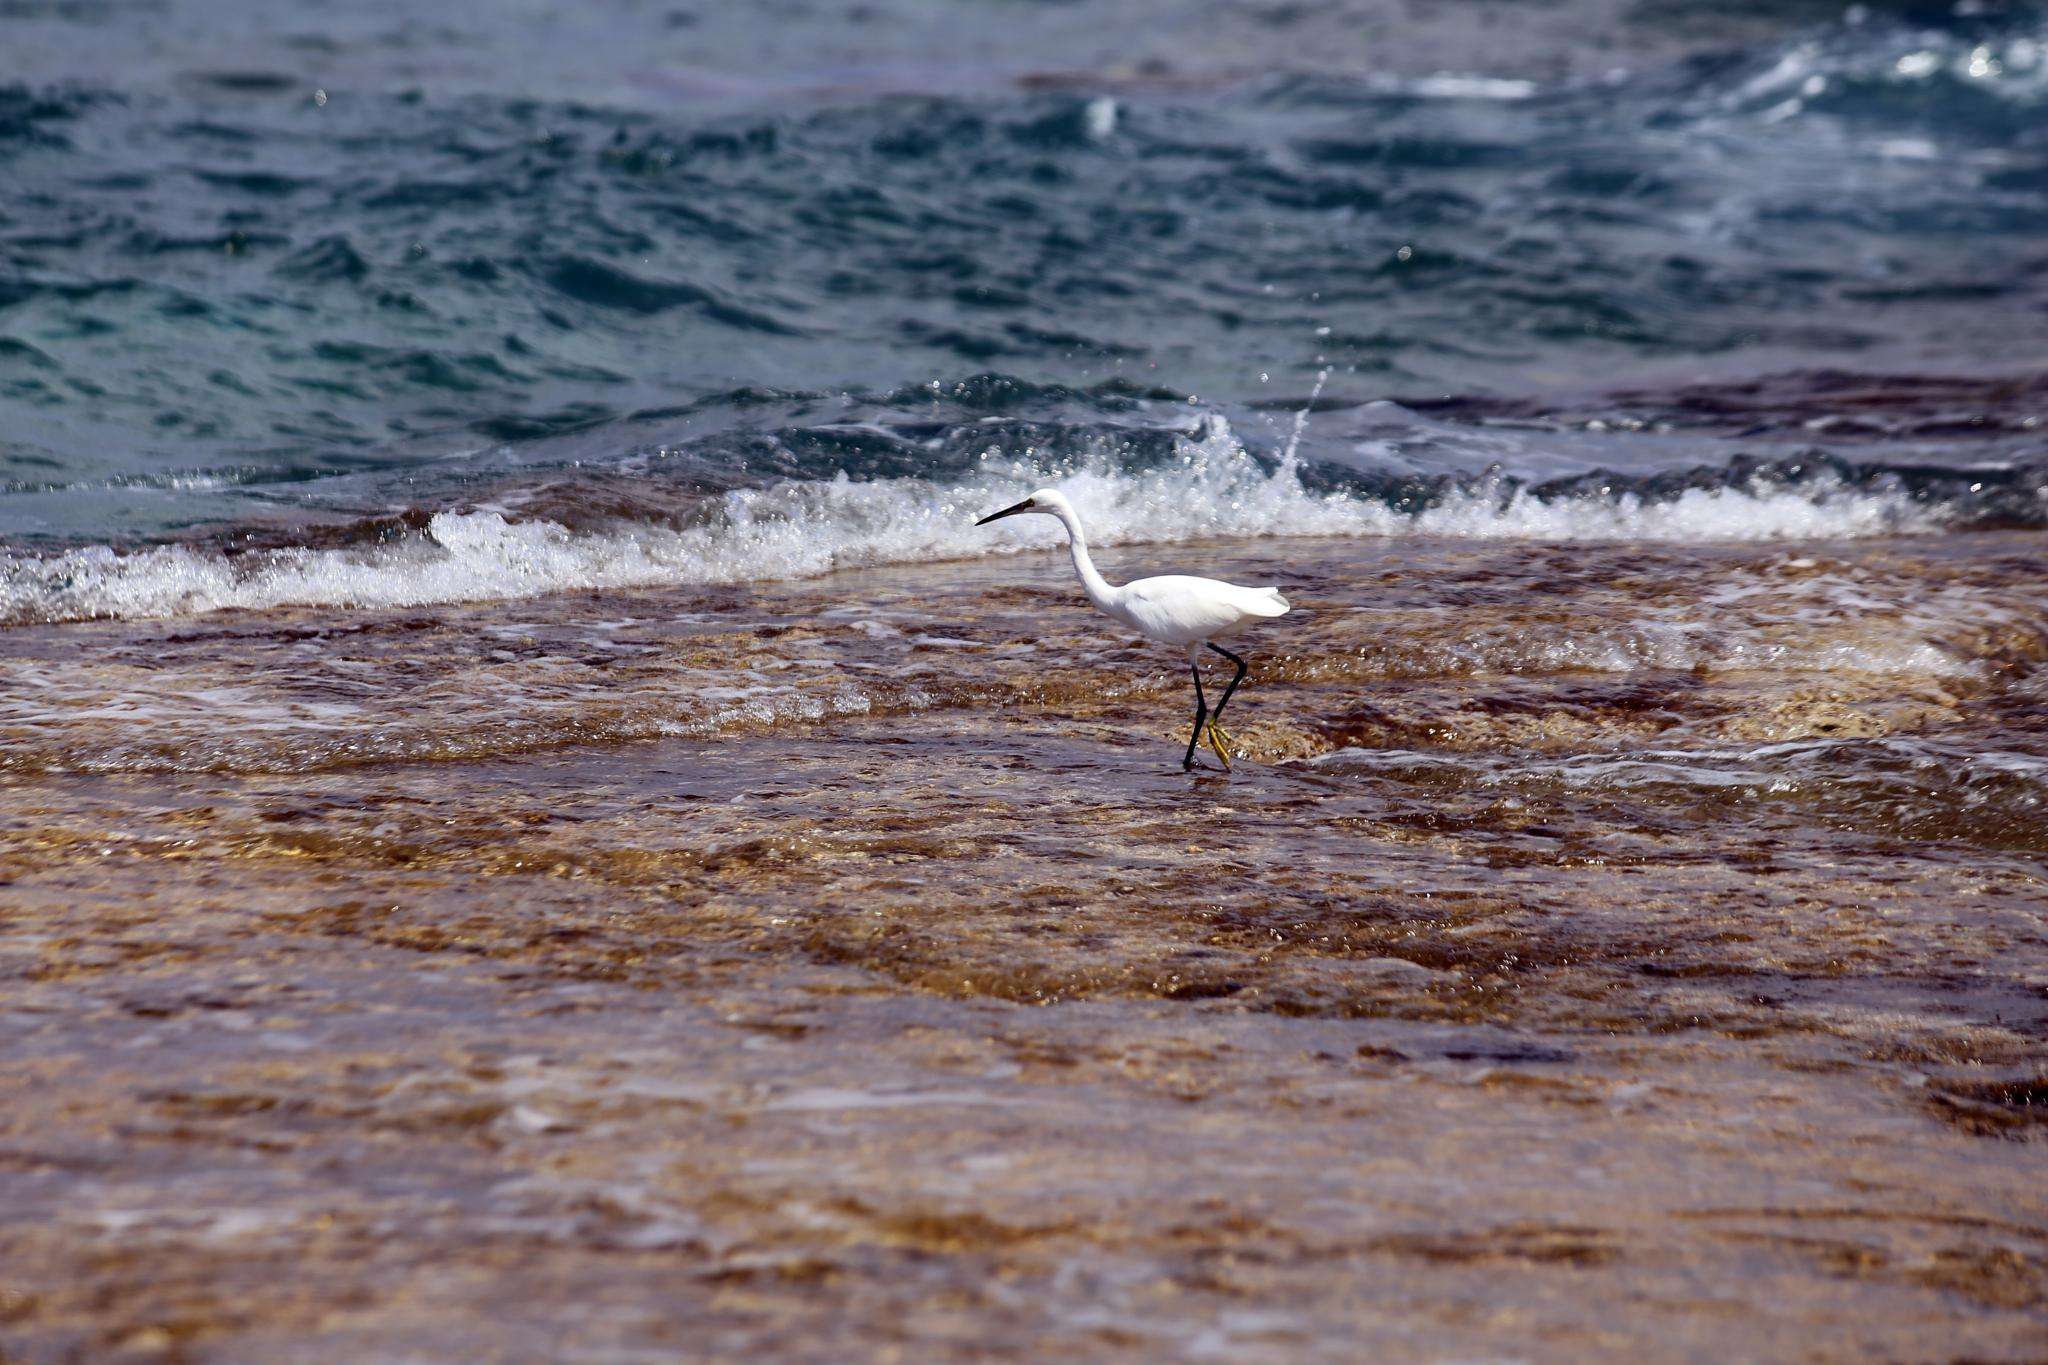 White waterbird in Crete by Davide 'Dado Dalle Ave